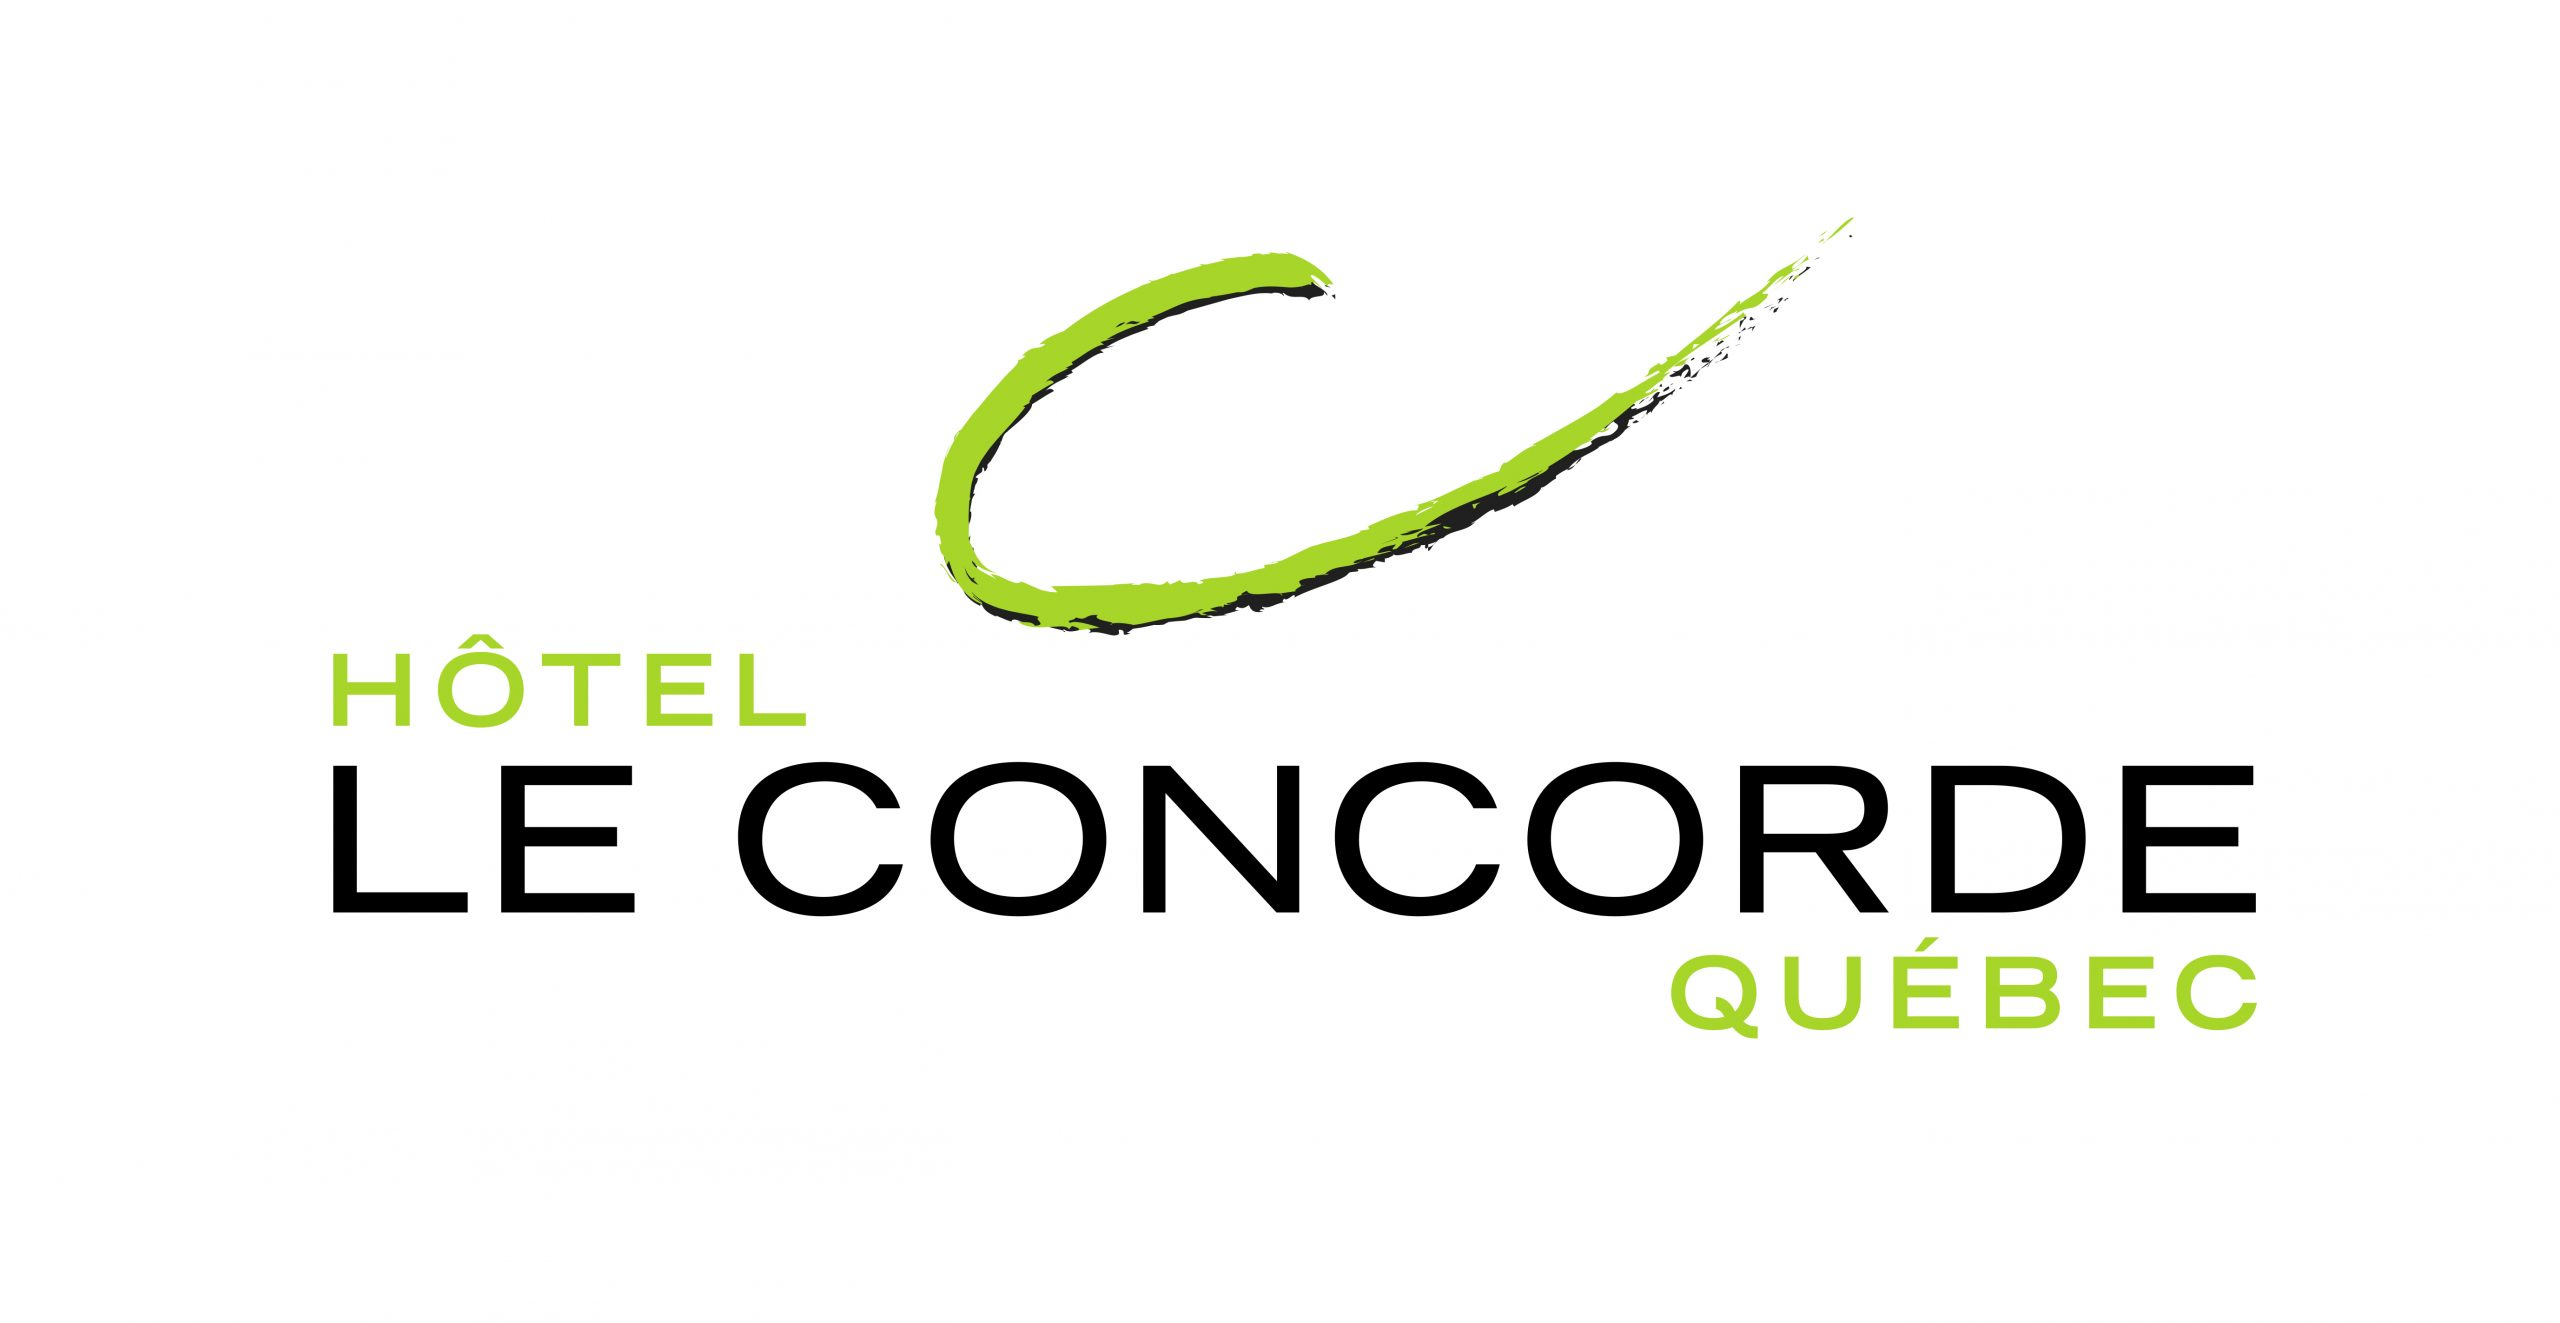 LARGE-logotype_LeConcordeHotel